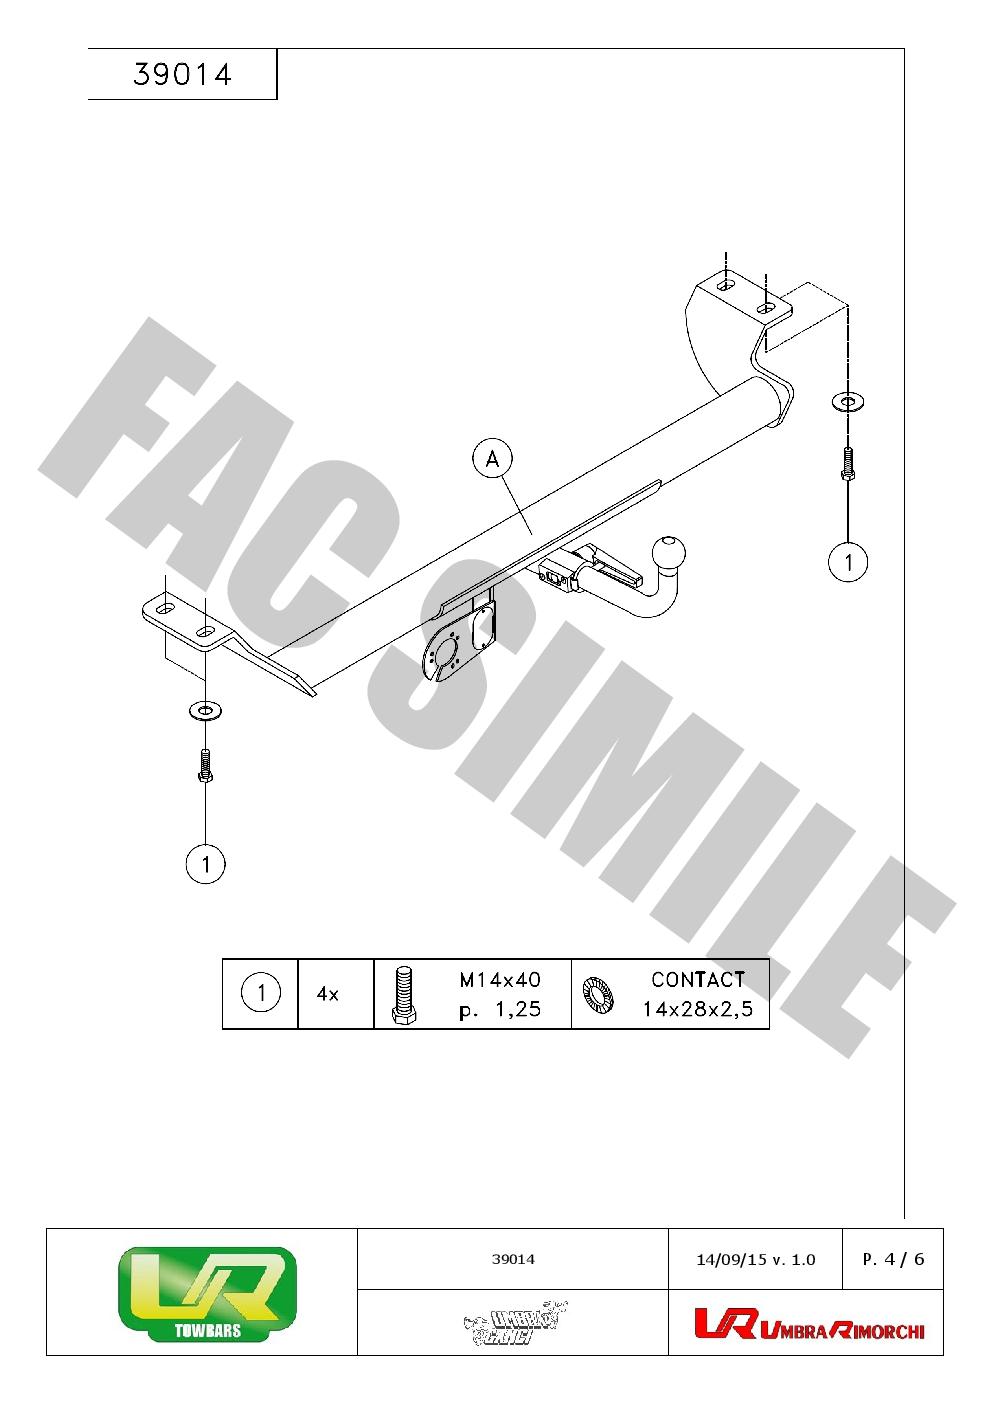 Detachable Towbar 13p C2 Wiring Kit For Toyota Carina E Estate 95 97 Fuse Box Location Tripleboo Market